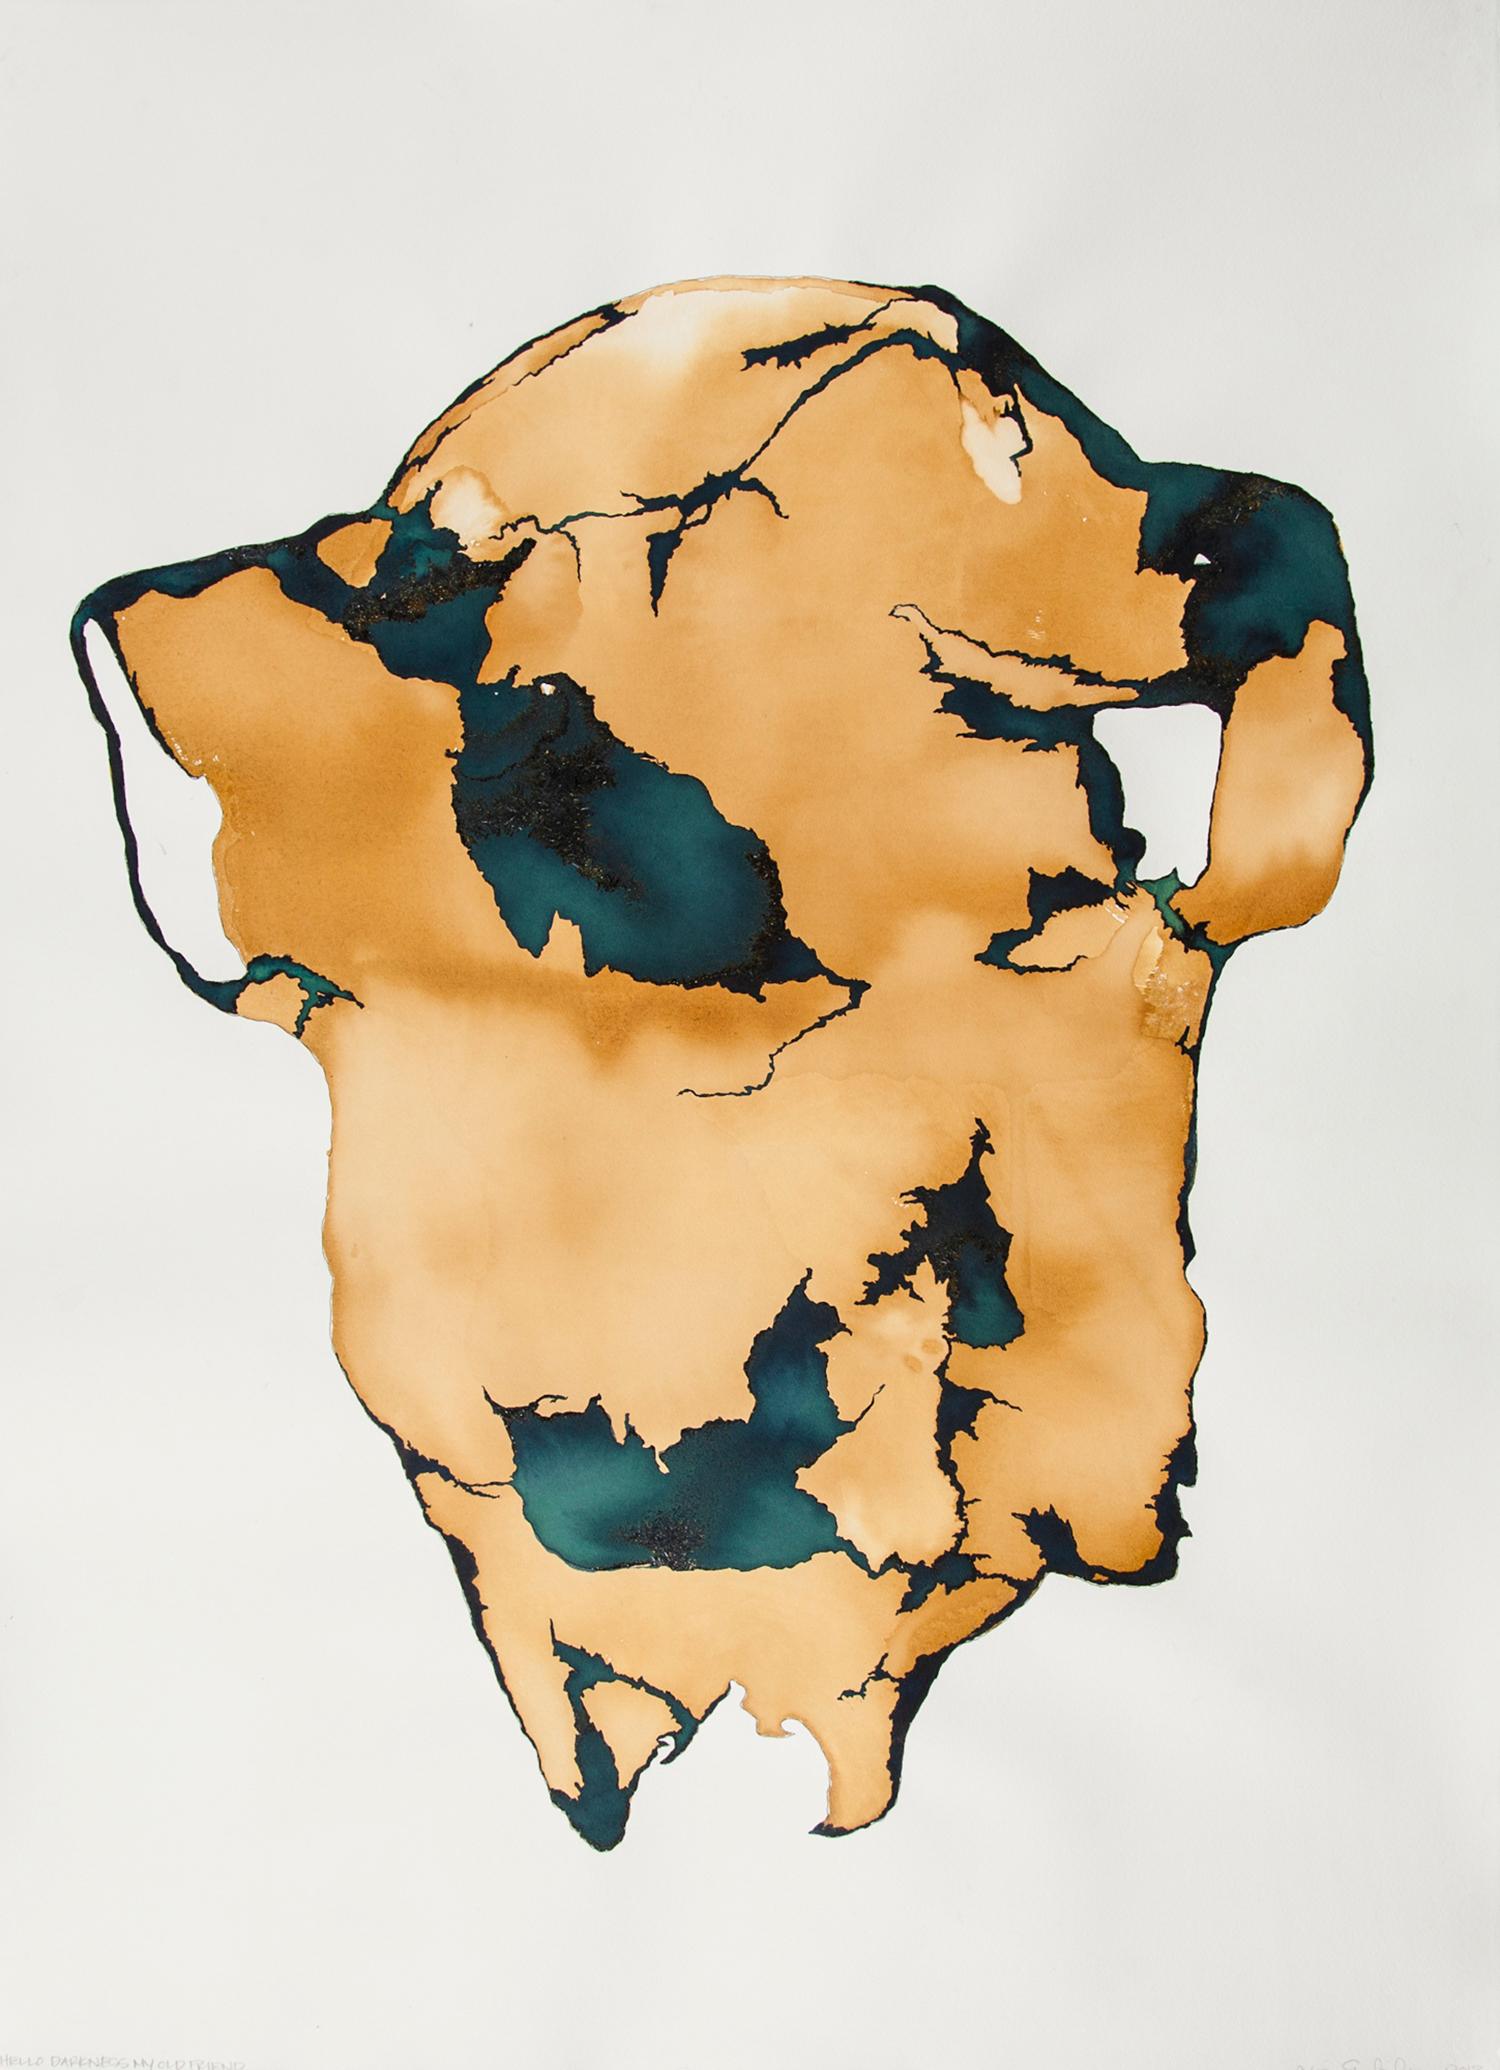 """Iceland: Exposure One"" by Ali Gradischer"